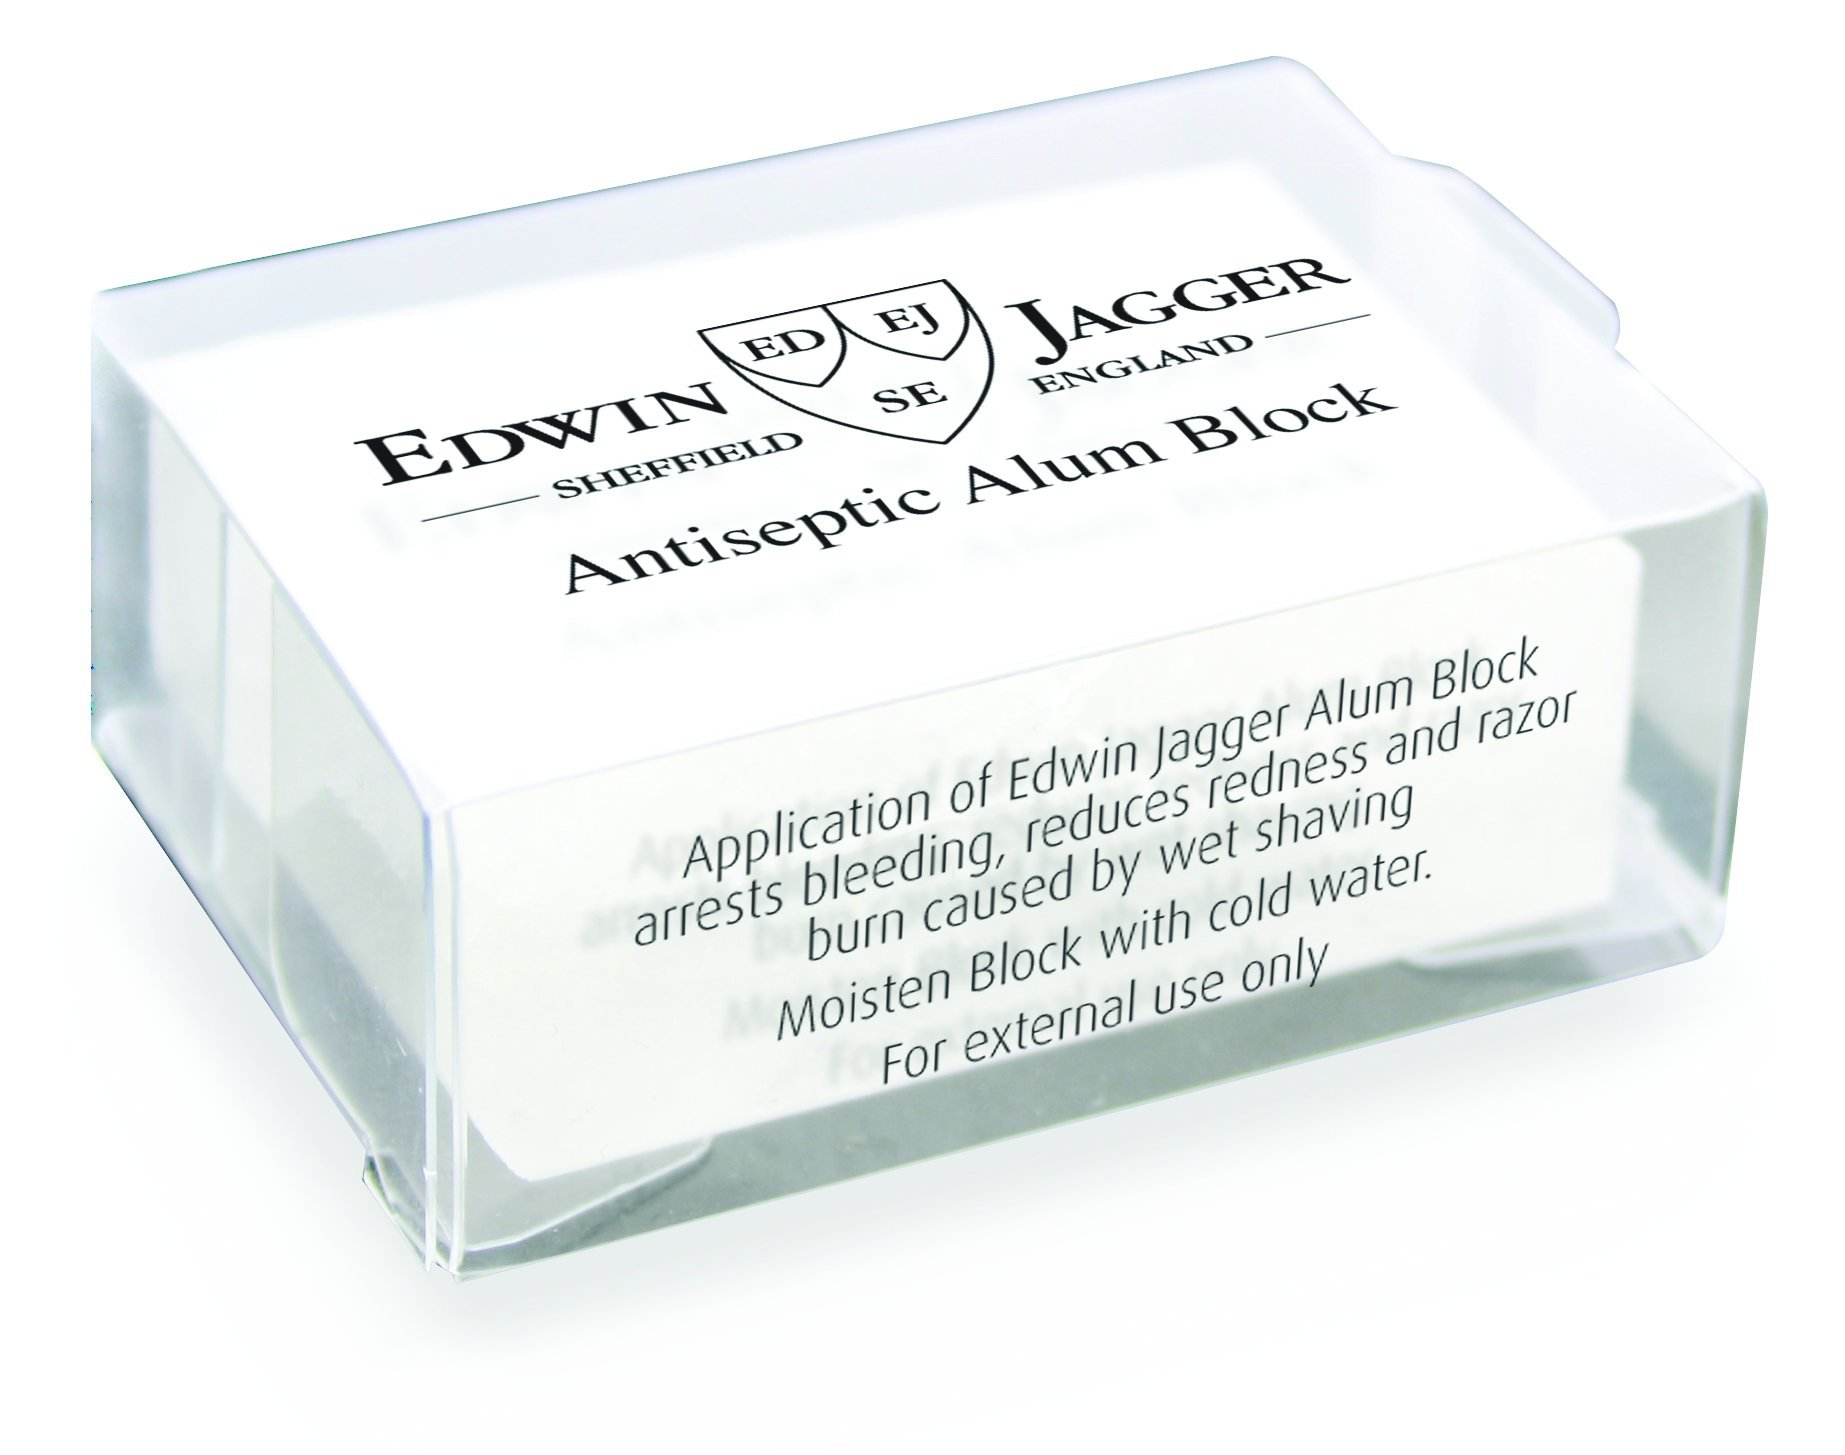 Edwin Jagger Alum Block, 54g by Edwin Jagger